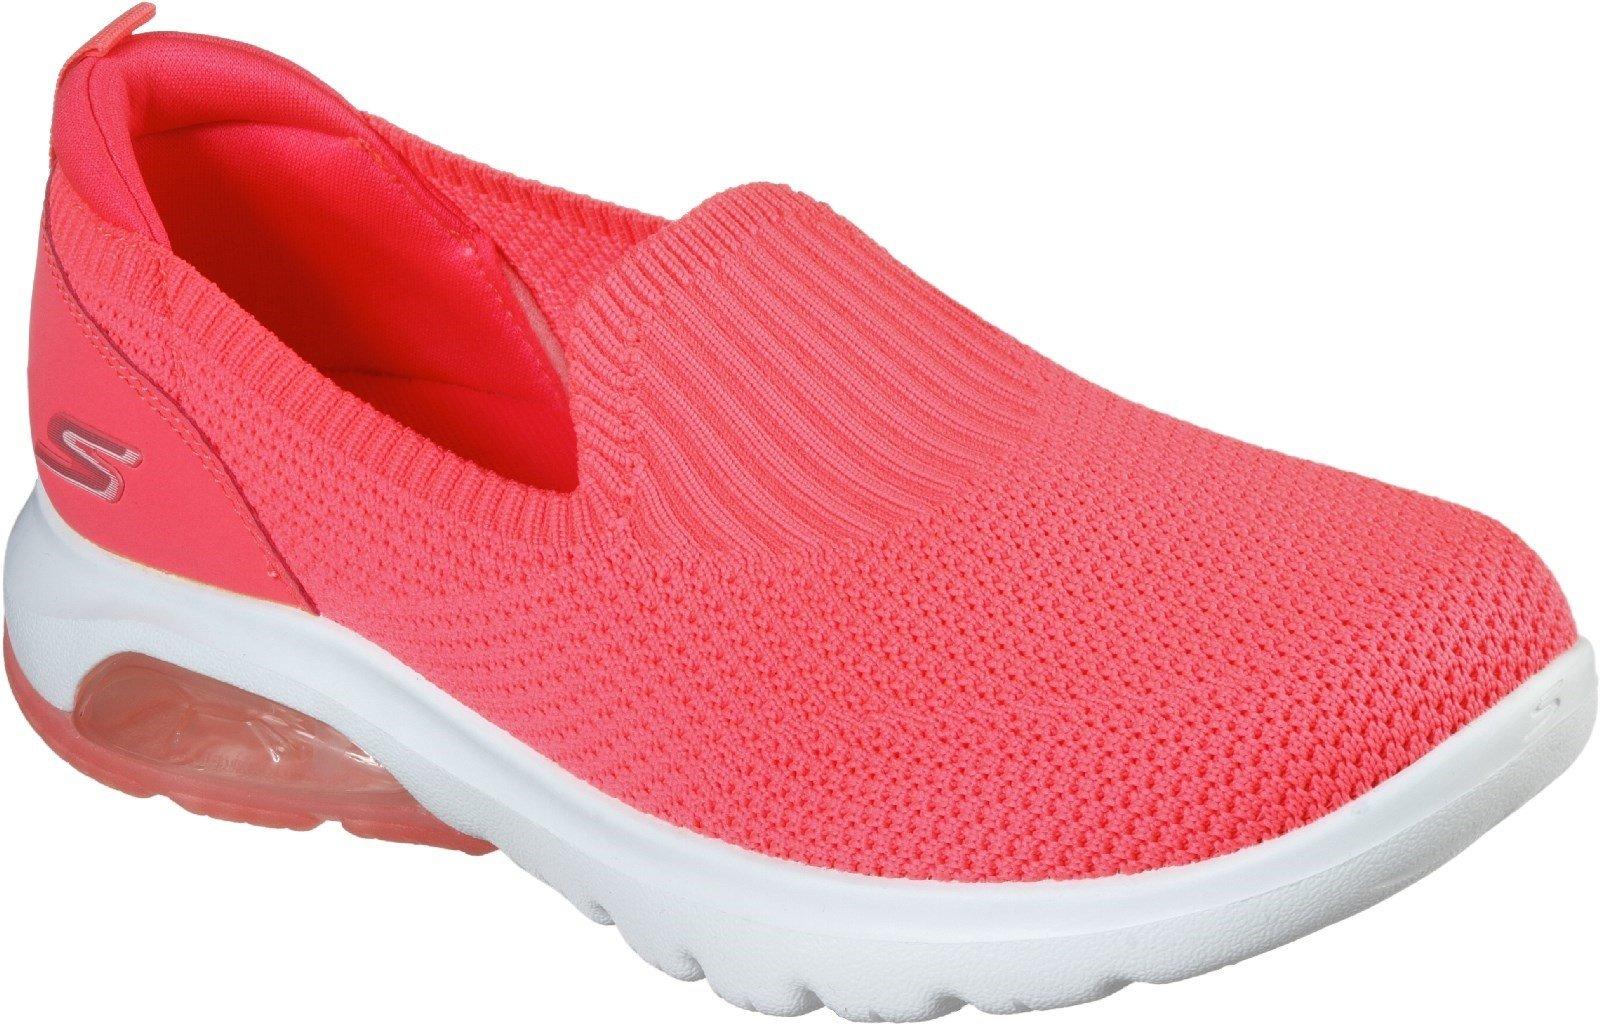 Skechers Women's Gowalk Air Slip On Trainer Various Colours 30344 - Hot Pink 3